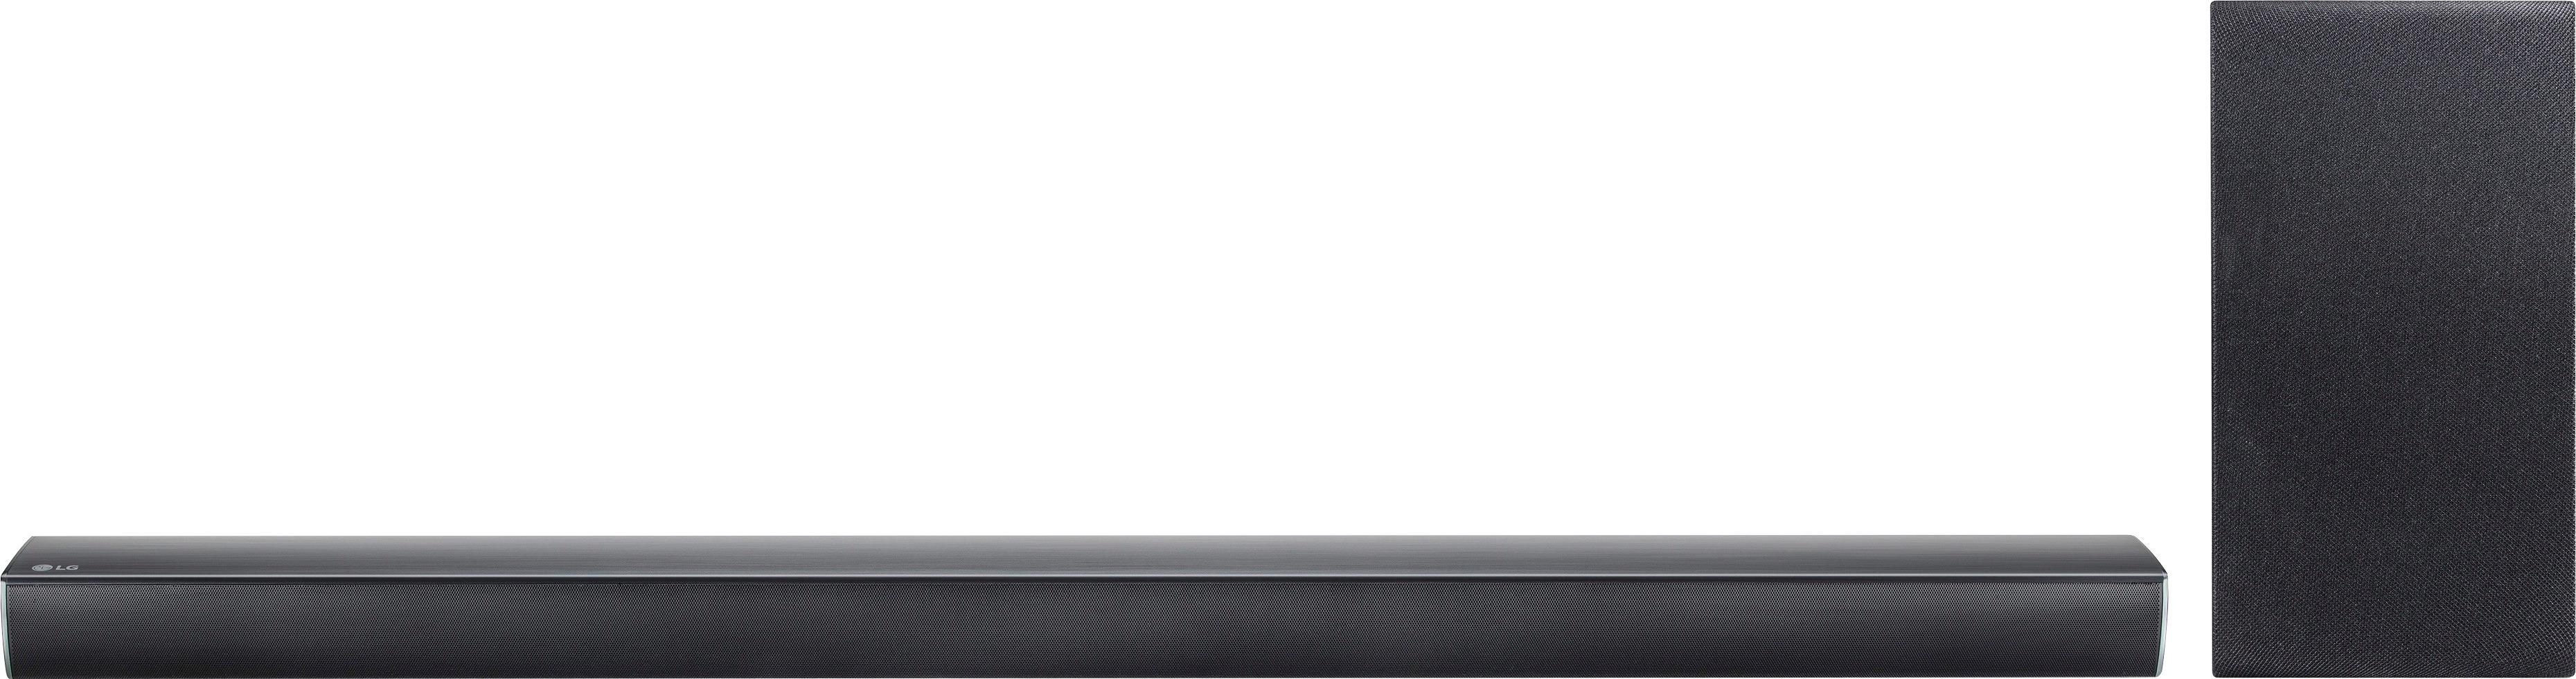 LG 2.1-Channel Hi-Res Soundbar System with Wireless Subwoofer and Digital Amplifier Black SJ4Y-S